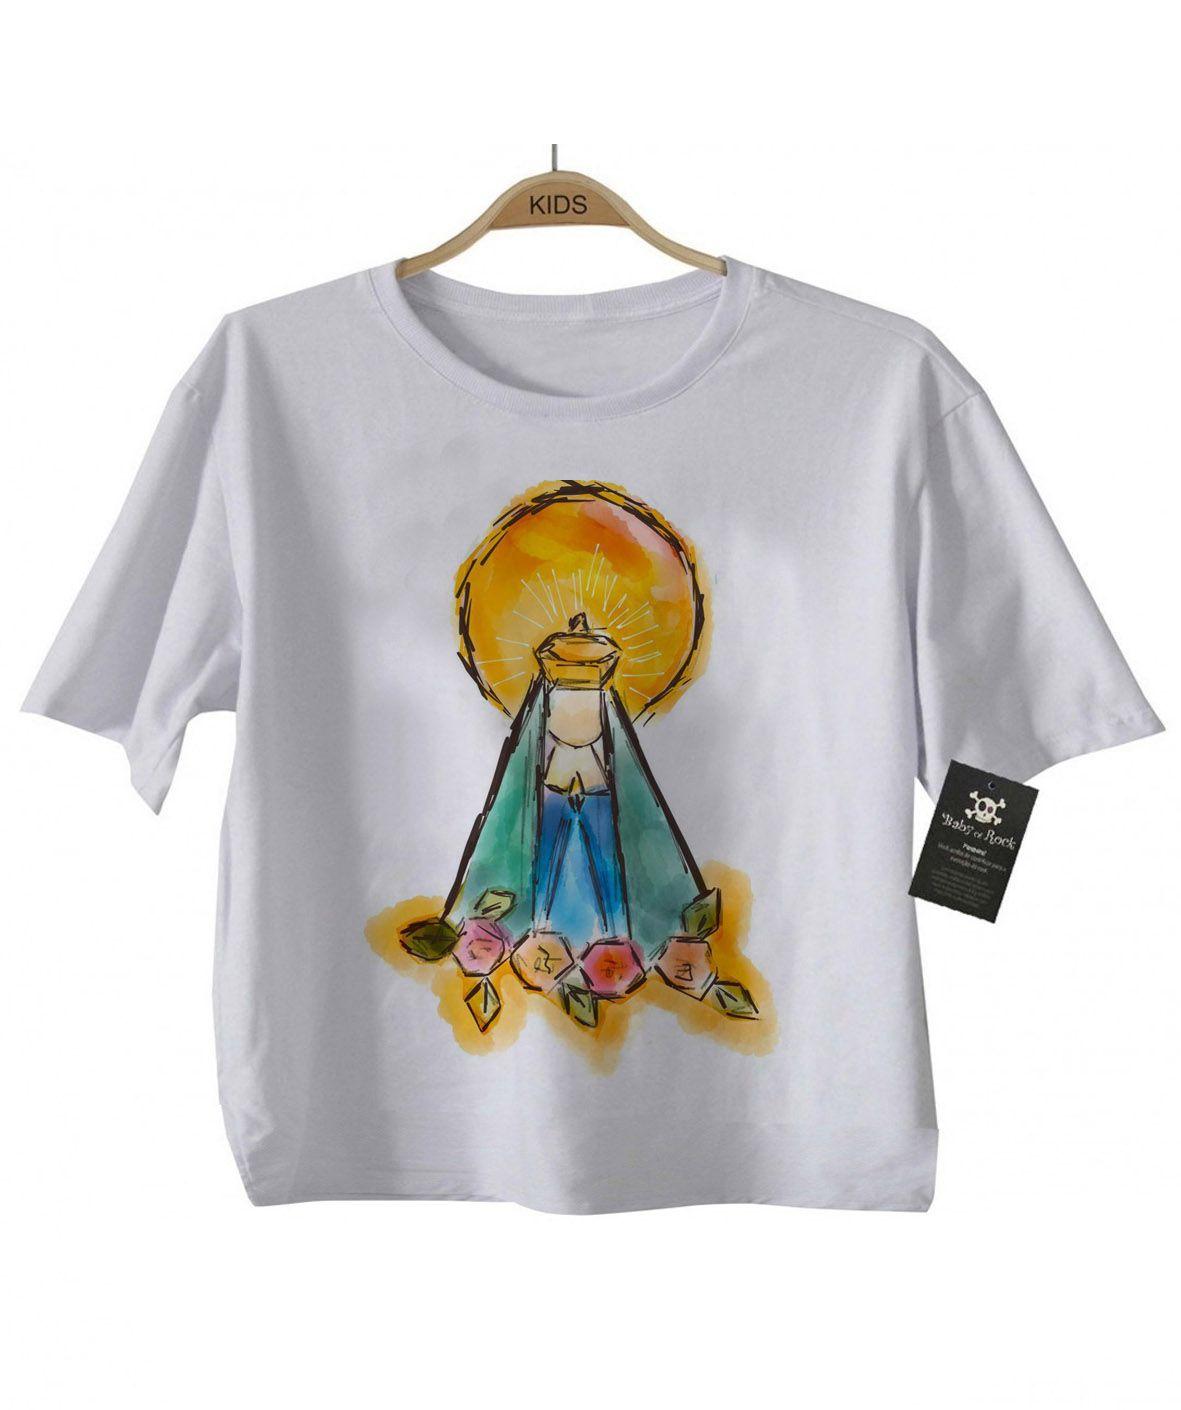 Camiseta Gospel  - Nossa Senhora Yellow - White  - Baby Monster S/A